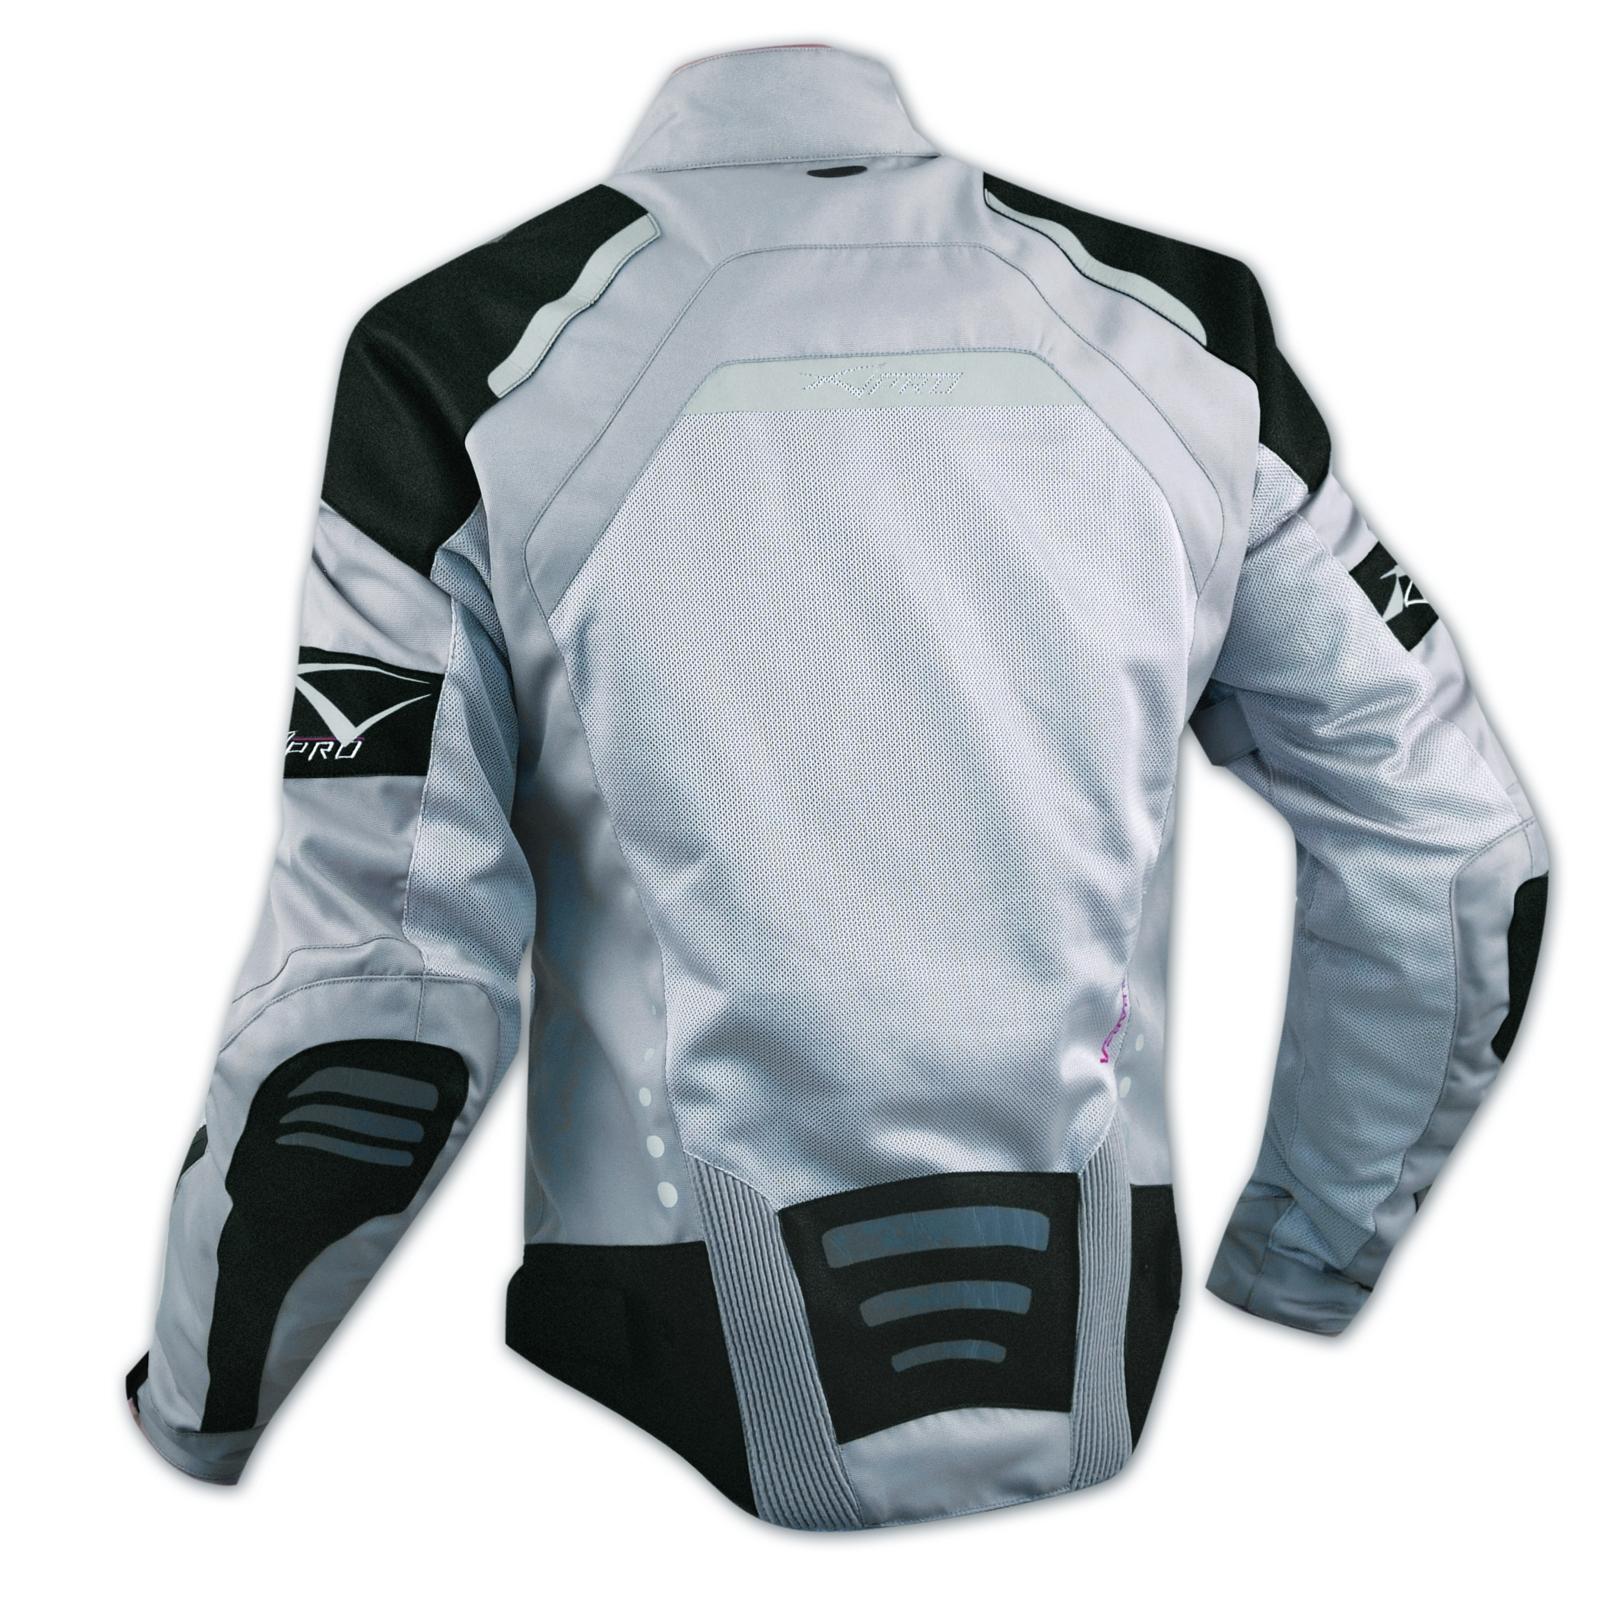 Giacca-Moto-Tessuto-Cordura-Mesh-Rete-Traforata-Protezioni-CE-Omologate-Grigio miniatura 5